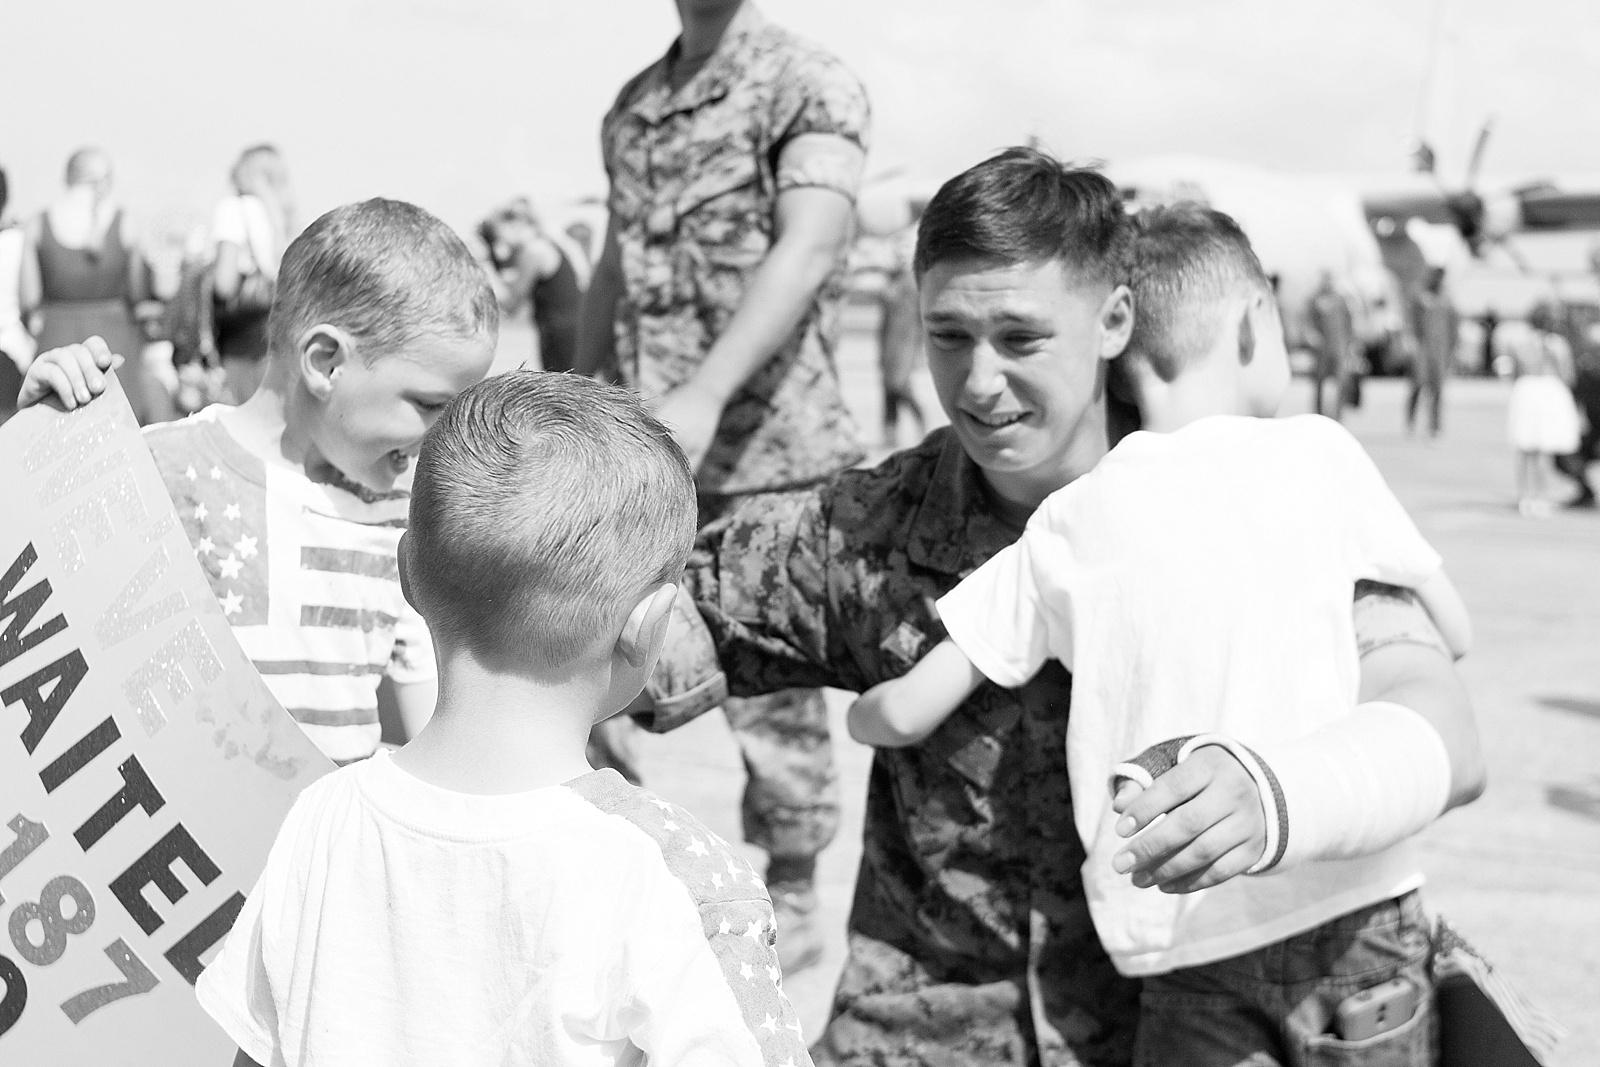 USMC C-130 homecoming photography at MCAS Cherry Point hangar from North Carolina portrait photographer Lauren Nygard